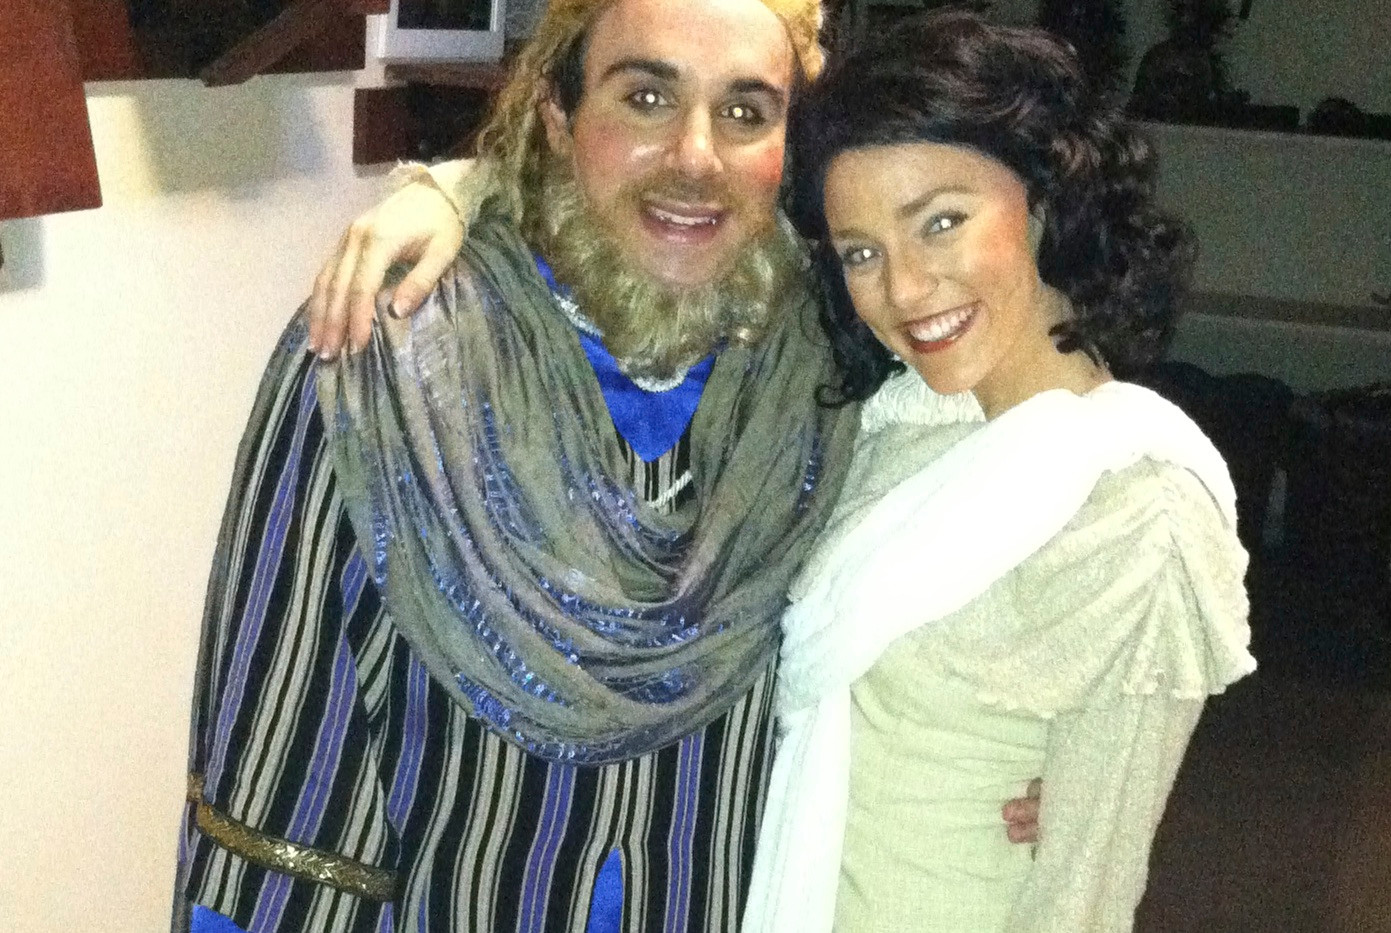 Myself (as Jonah) and Mary Lamb.